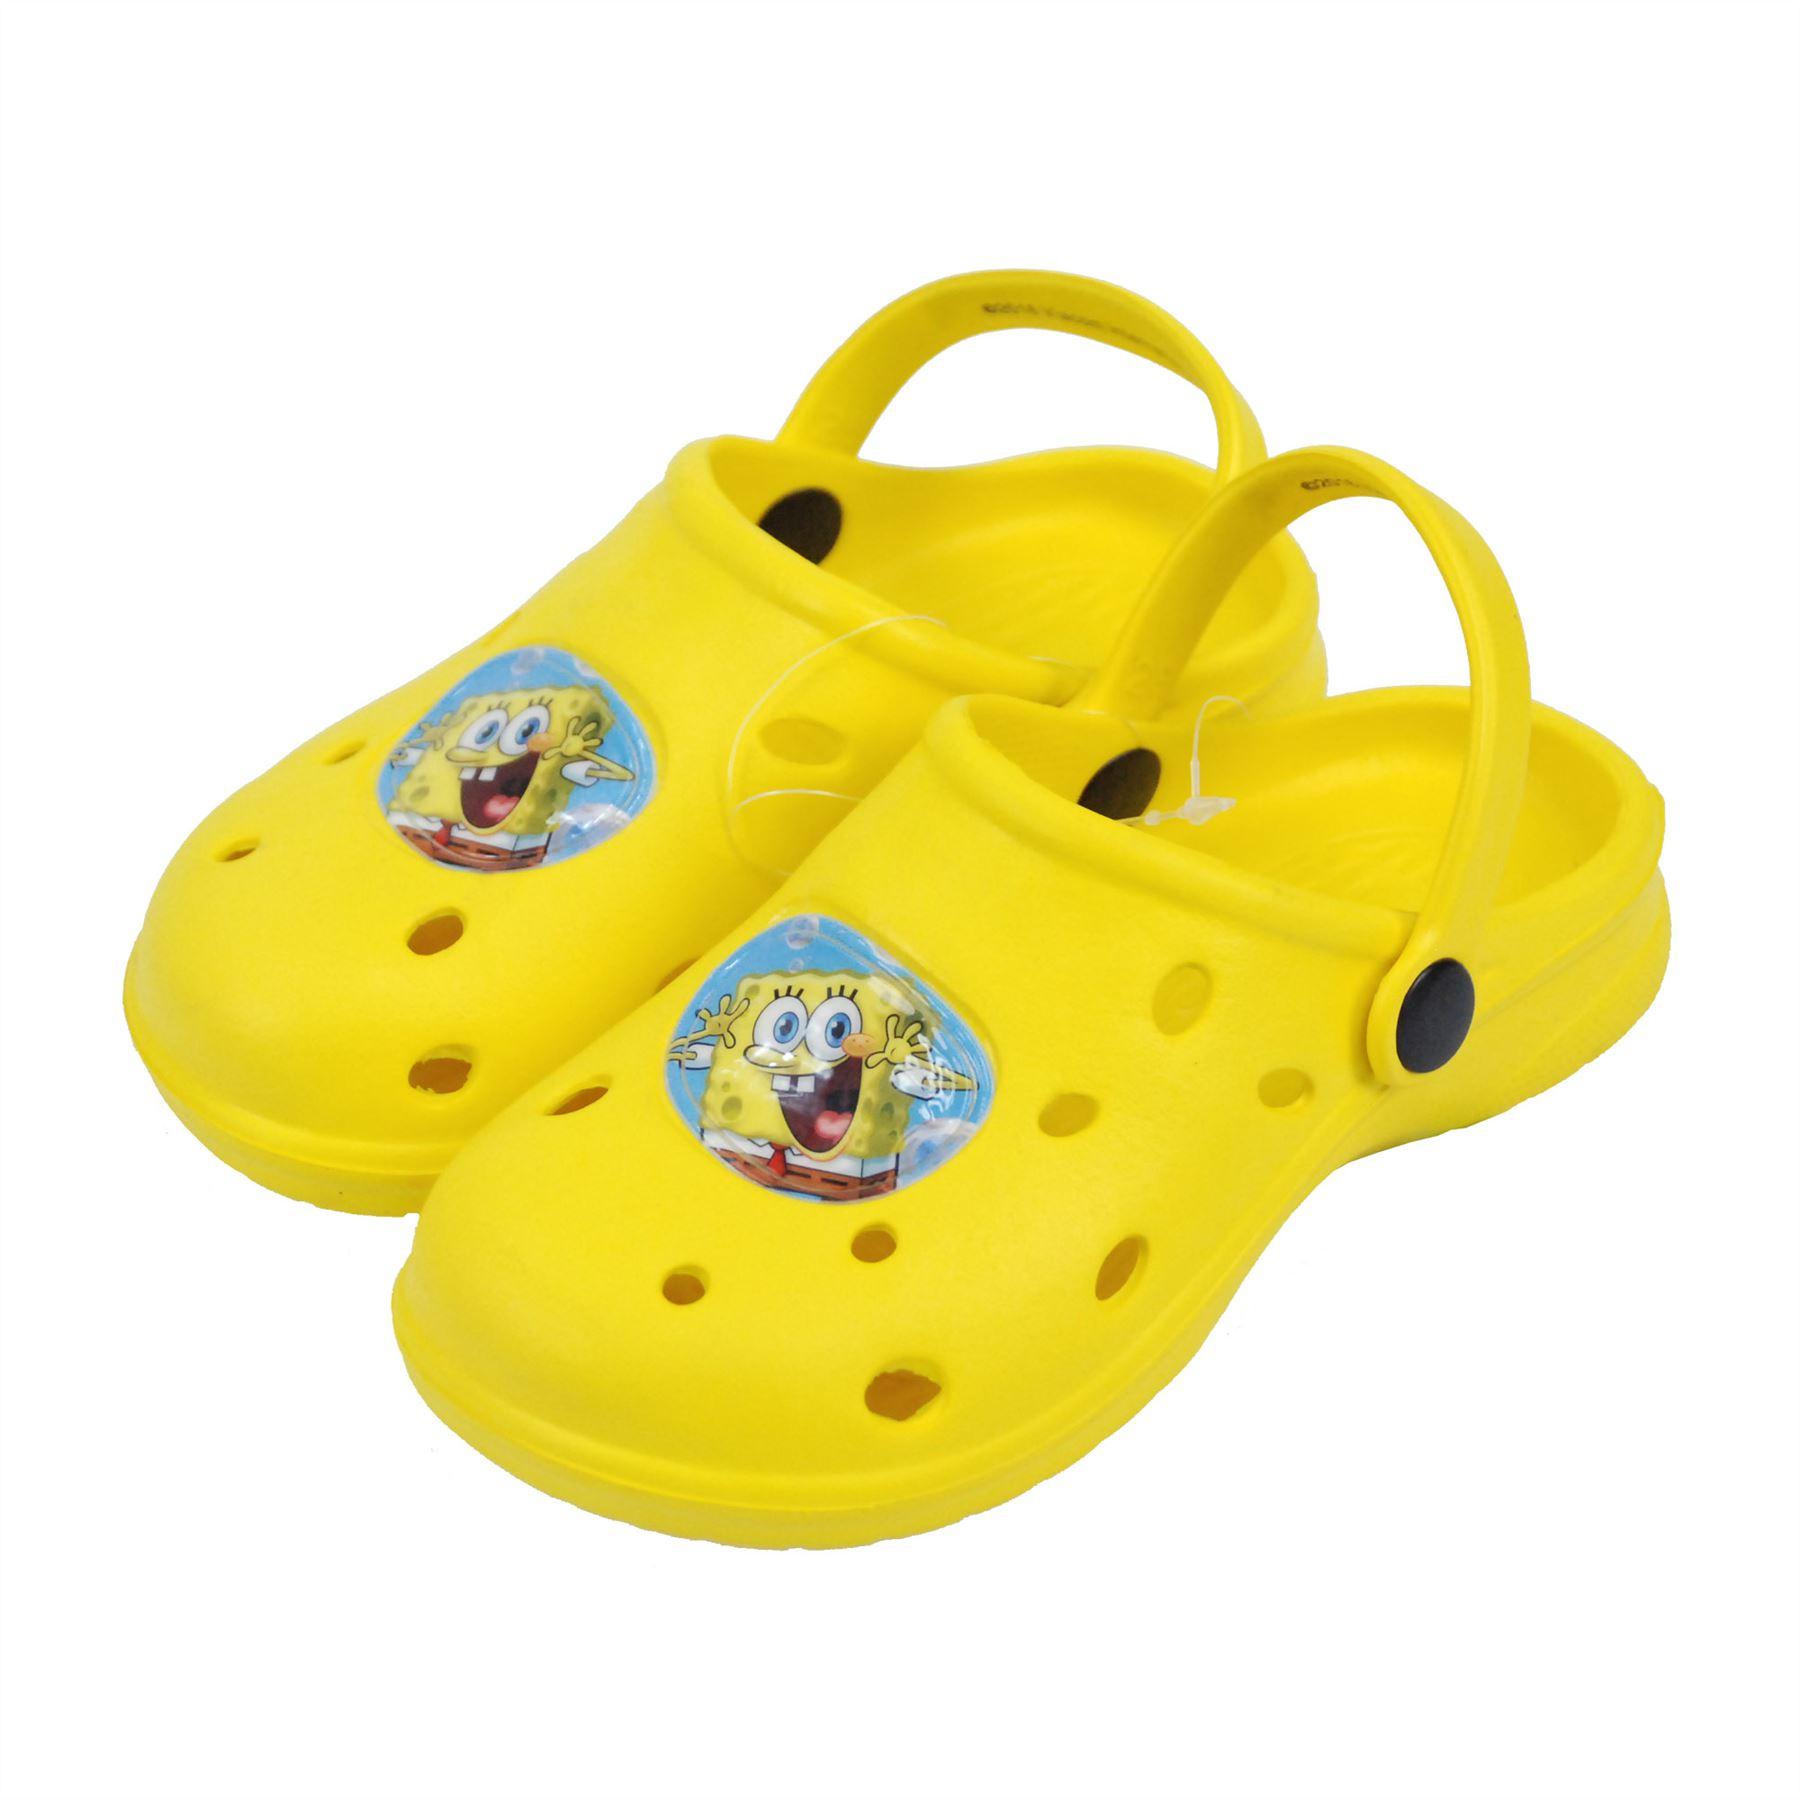 8b57517fc151 Nickelodeon® SpongeBob Kids Sandals Crocs Beach Shoes UK Sizes ...